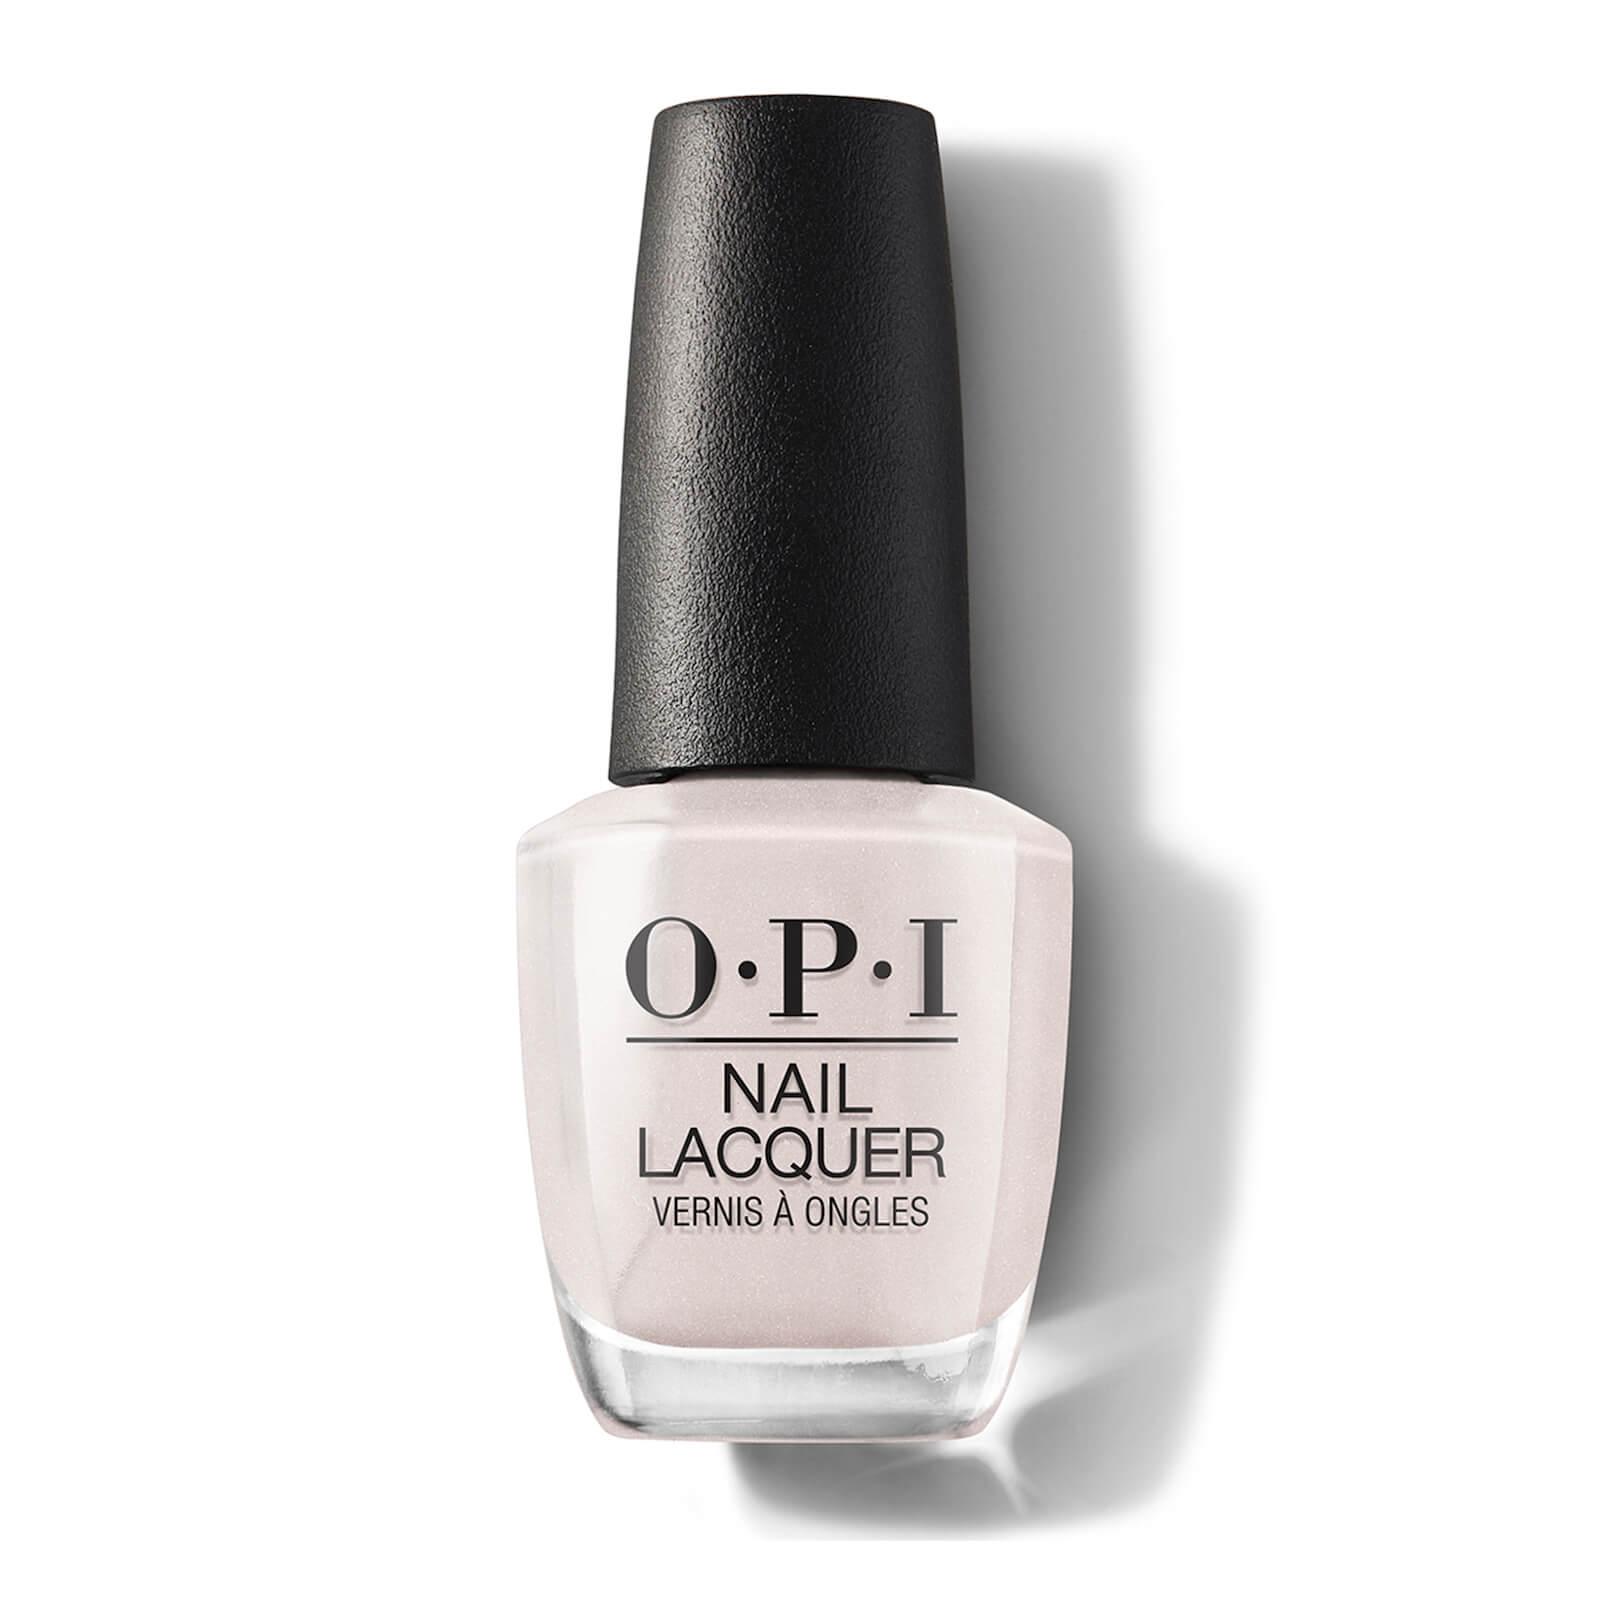 OPI Neo-Pearl Limited Edition Shellabrate Good Times! Nail Polish 15ml